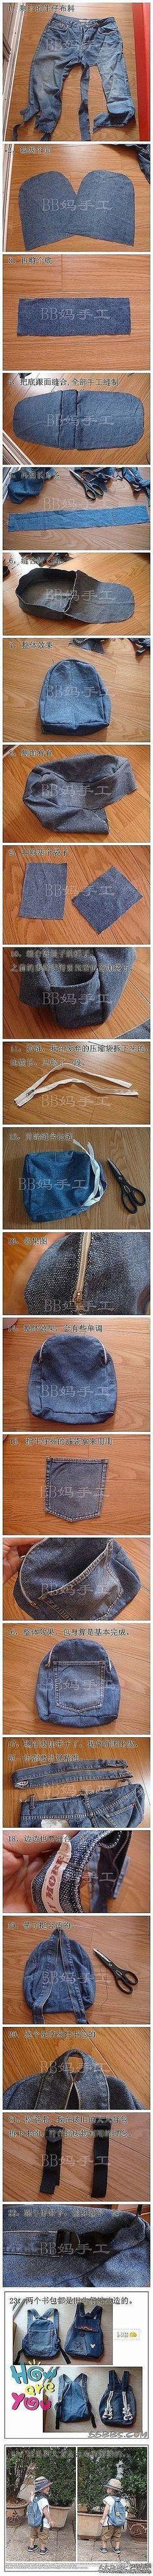 The handmade DIY [life creative】 denim backpack